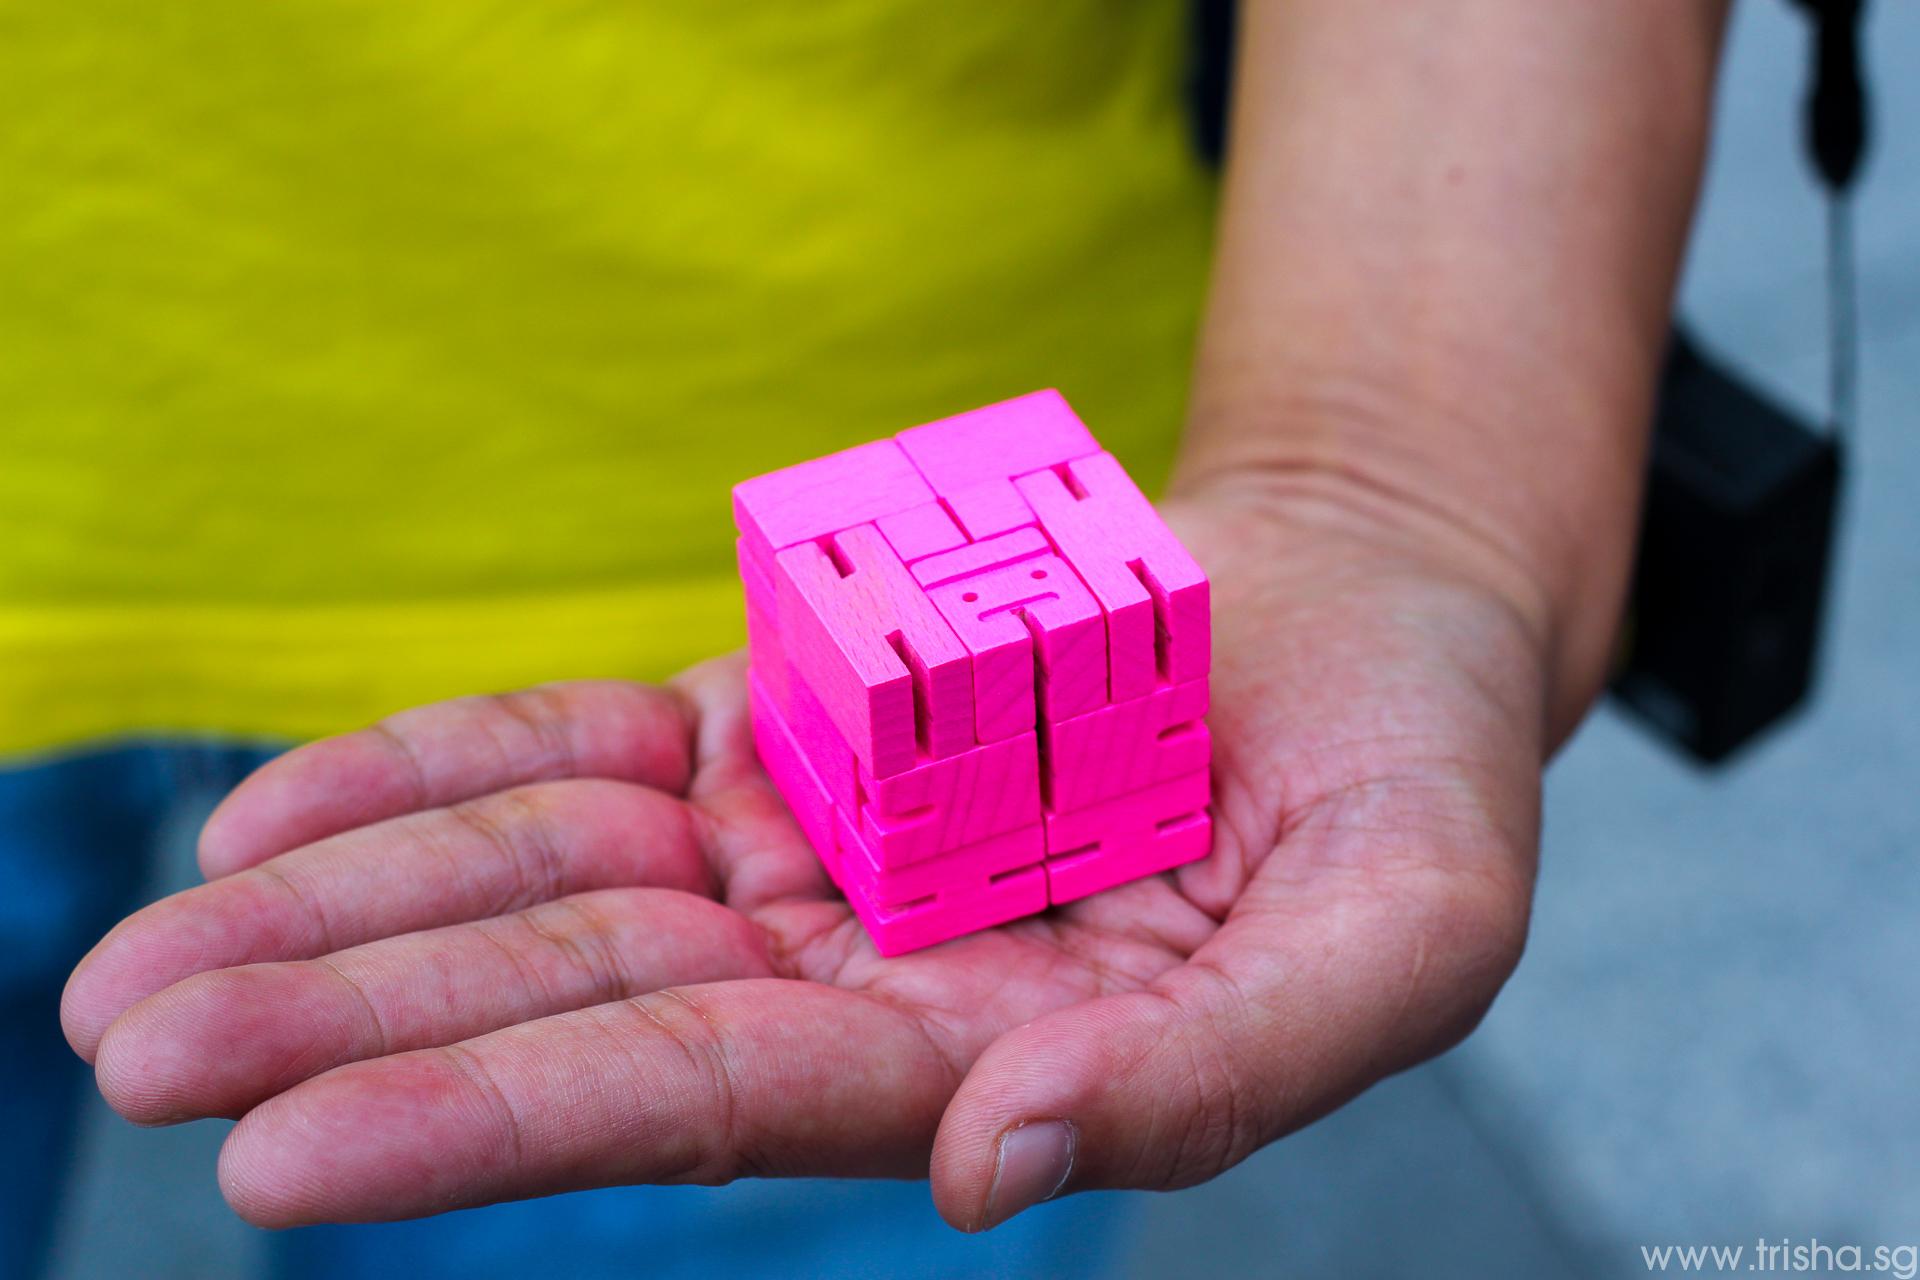 Toyart Cubebot Areaware Shutter Journey Singapore